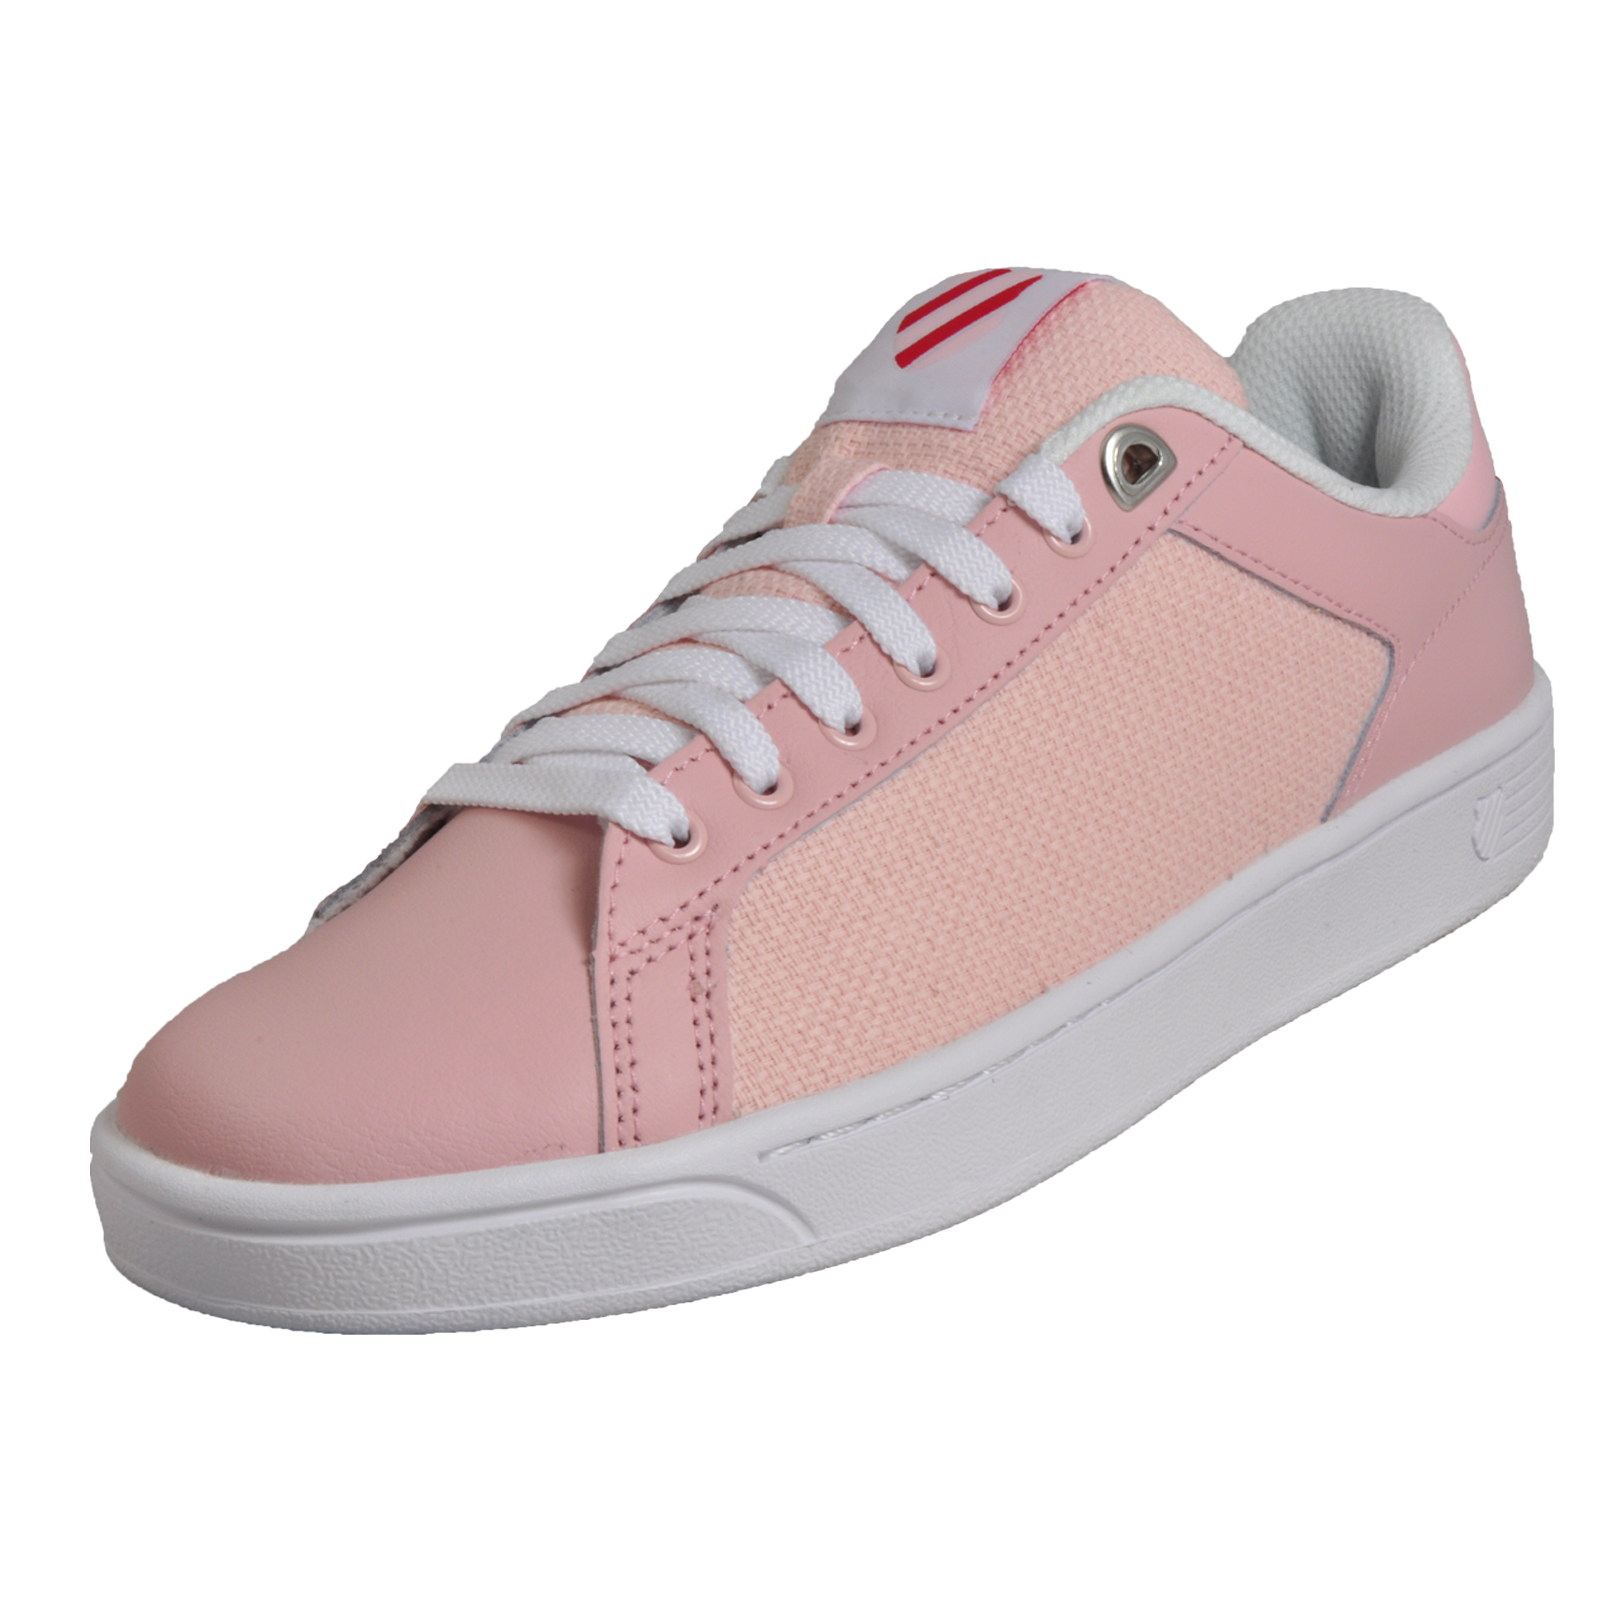 K Swiss Clean Court CMF Women s Girls Classic Memory Foam Trainers Pink 0fe7e1877